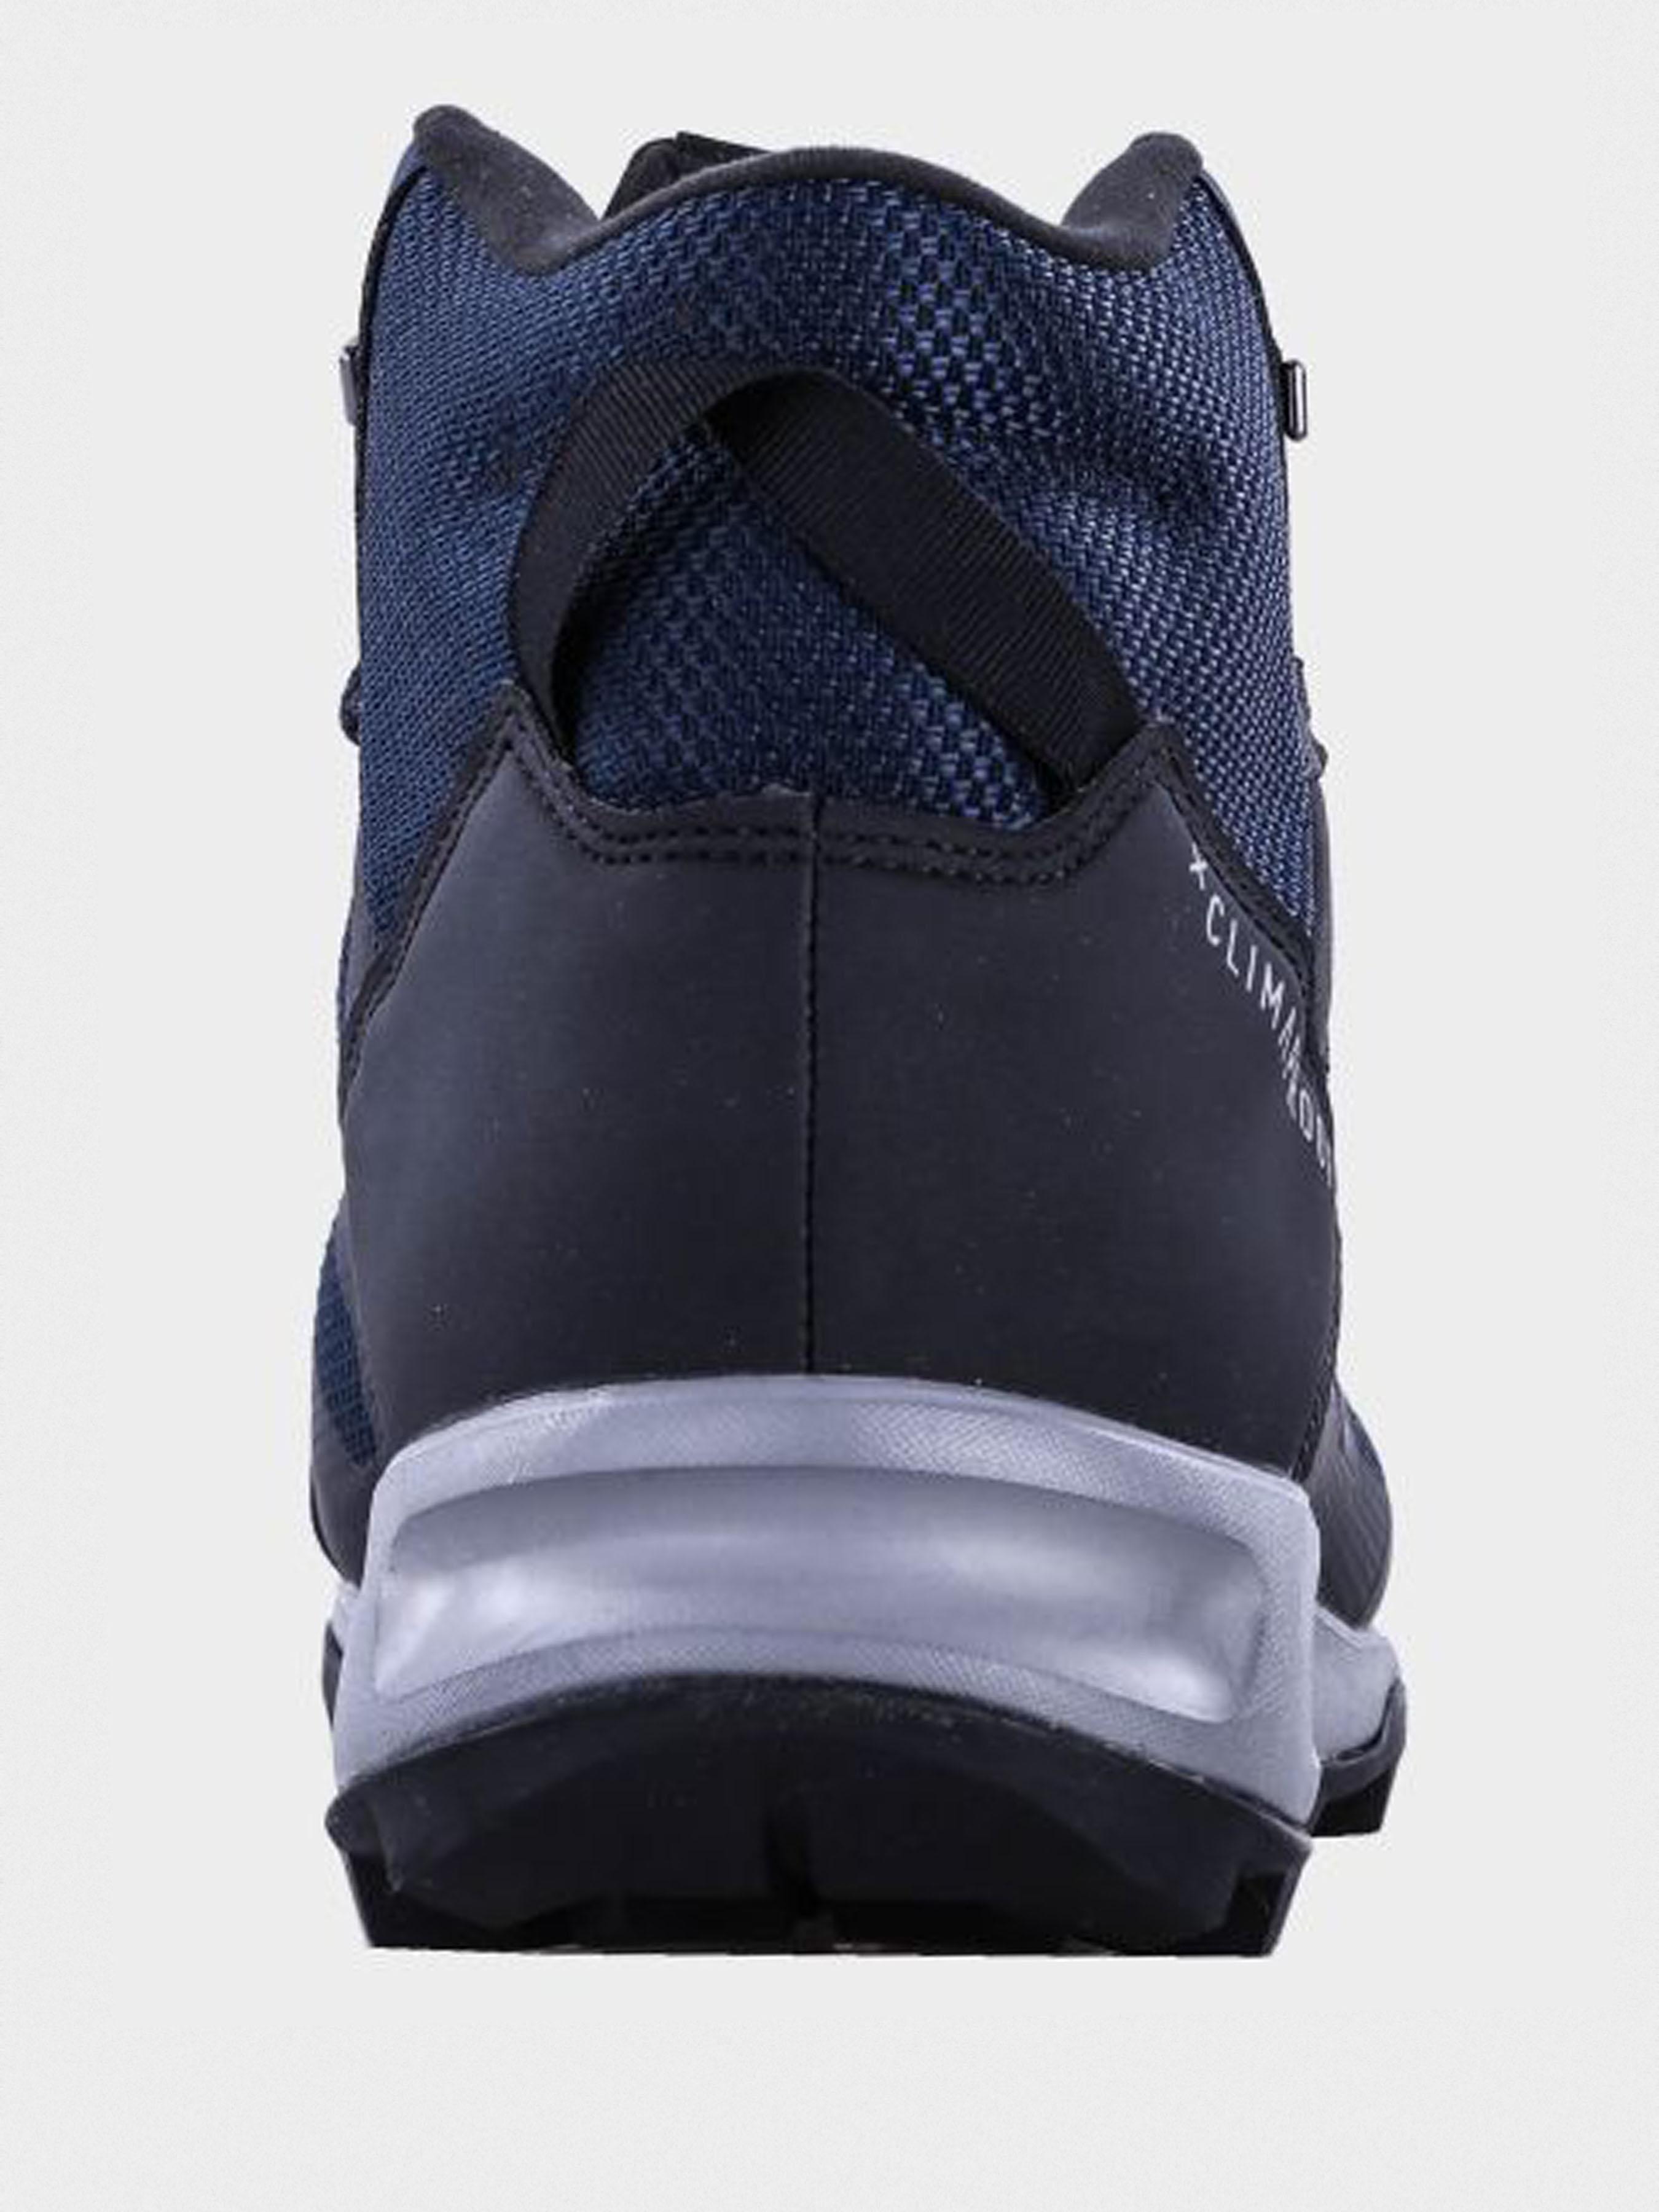 Ботинки для мужчин Adidas TERREX TIVID MID CP CN161 купить в Интертоп, 2017